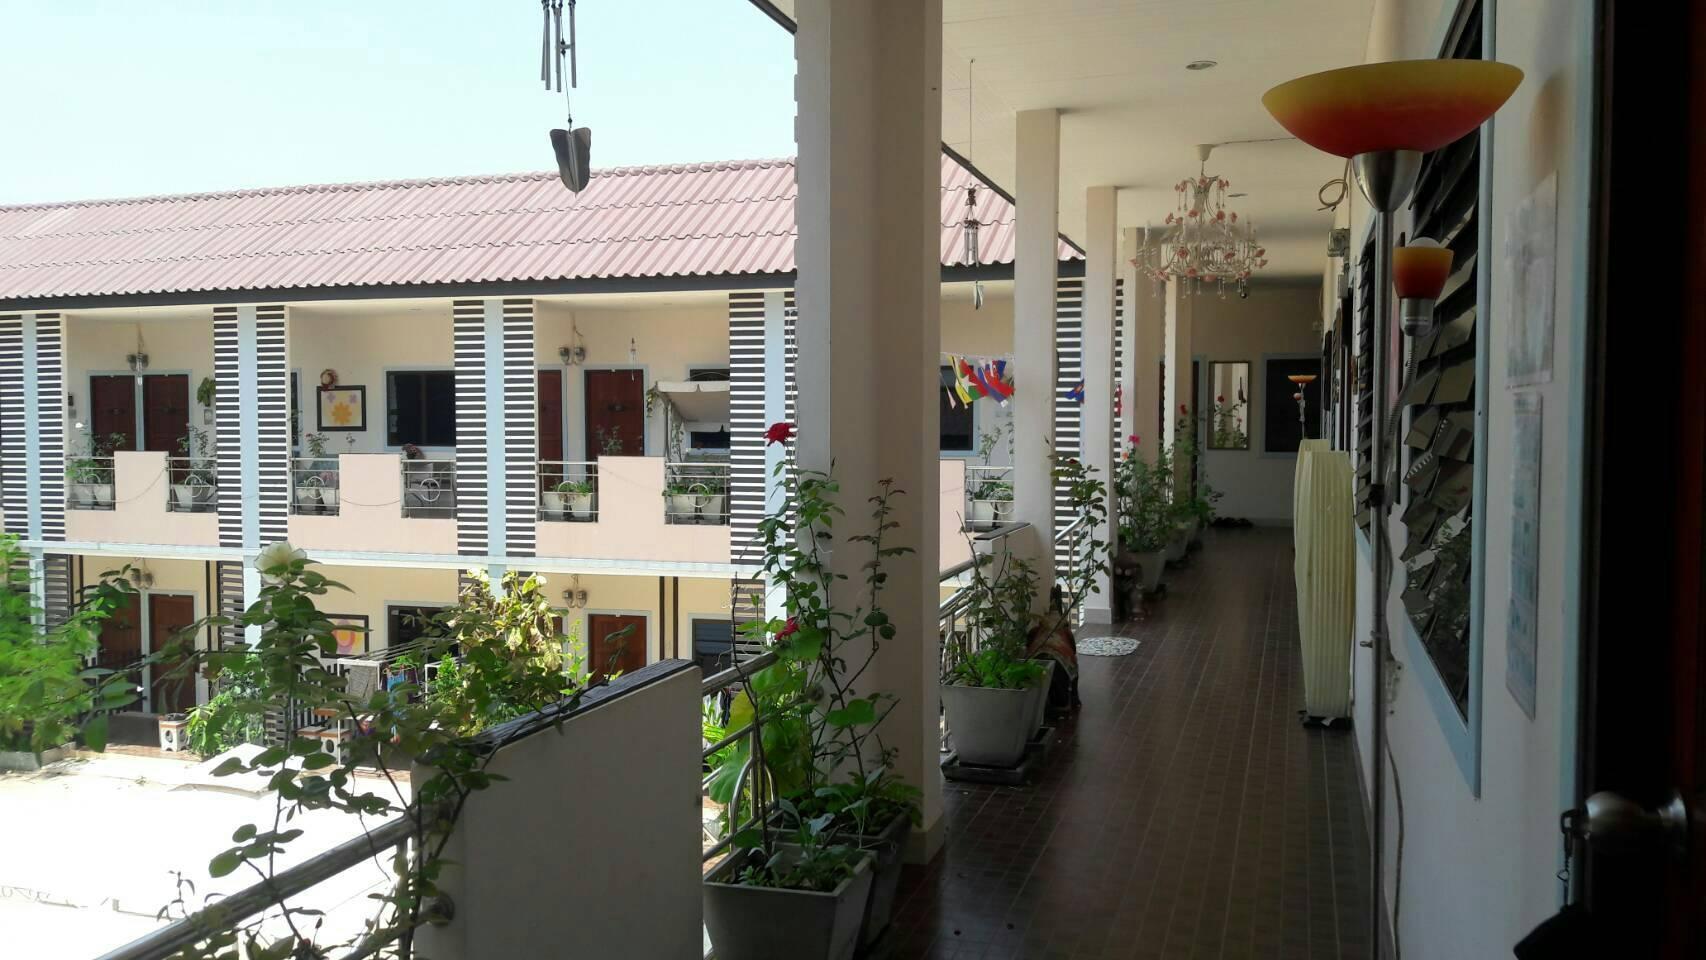 Ban Suan Kularb Surat Thani AirCon Room 4 สตูดิโอ อพาร์ตเมนต์ 1 ห้องน้ำส่วนตัว ขนาด 30 ตร.ม. – ซิตี้เซ็นเตอร์